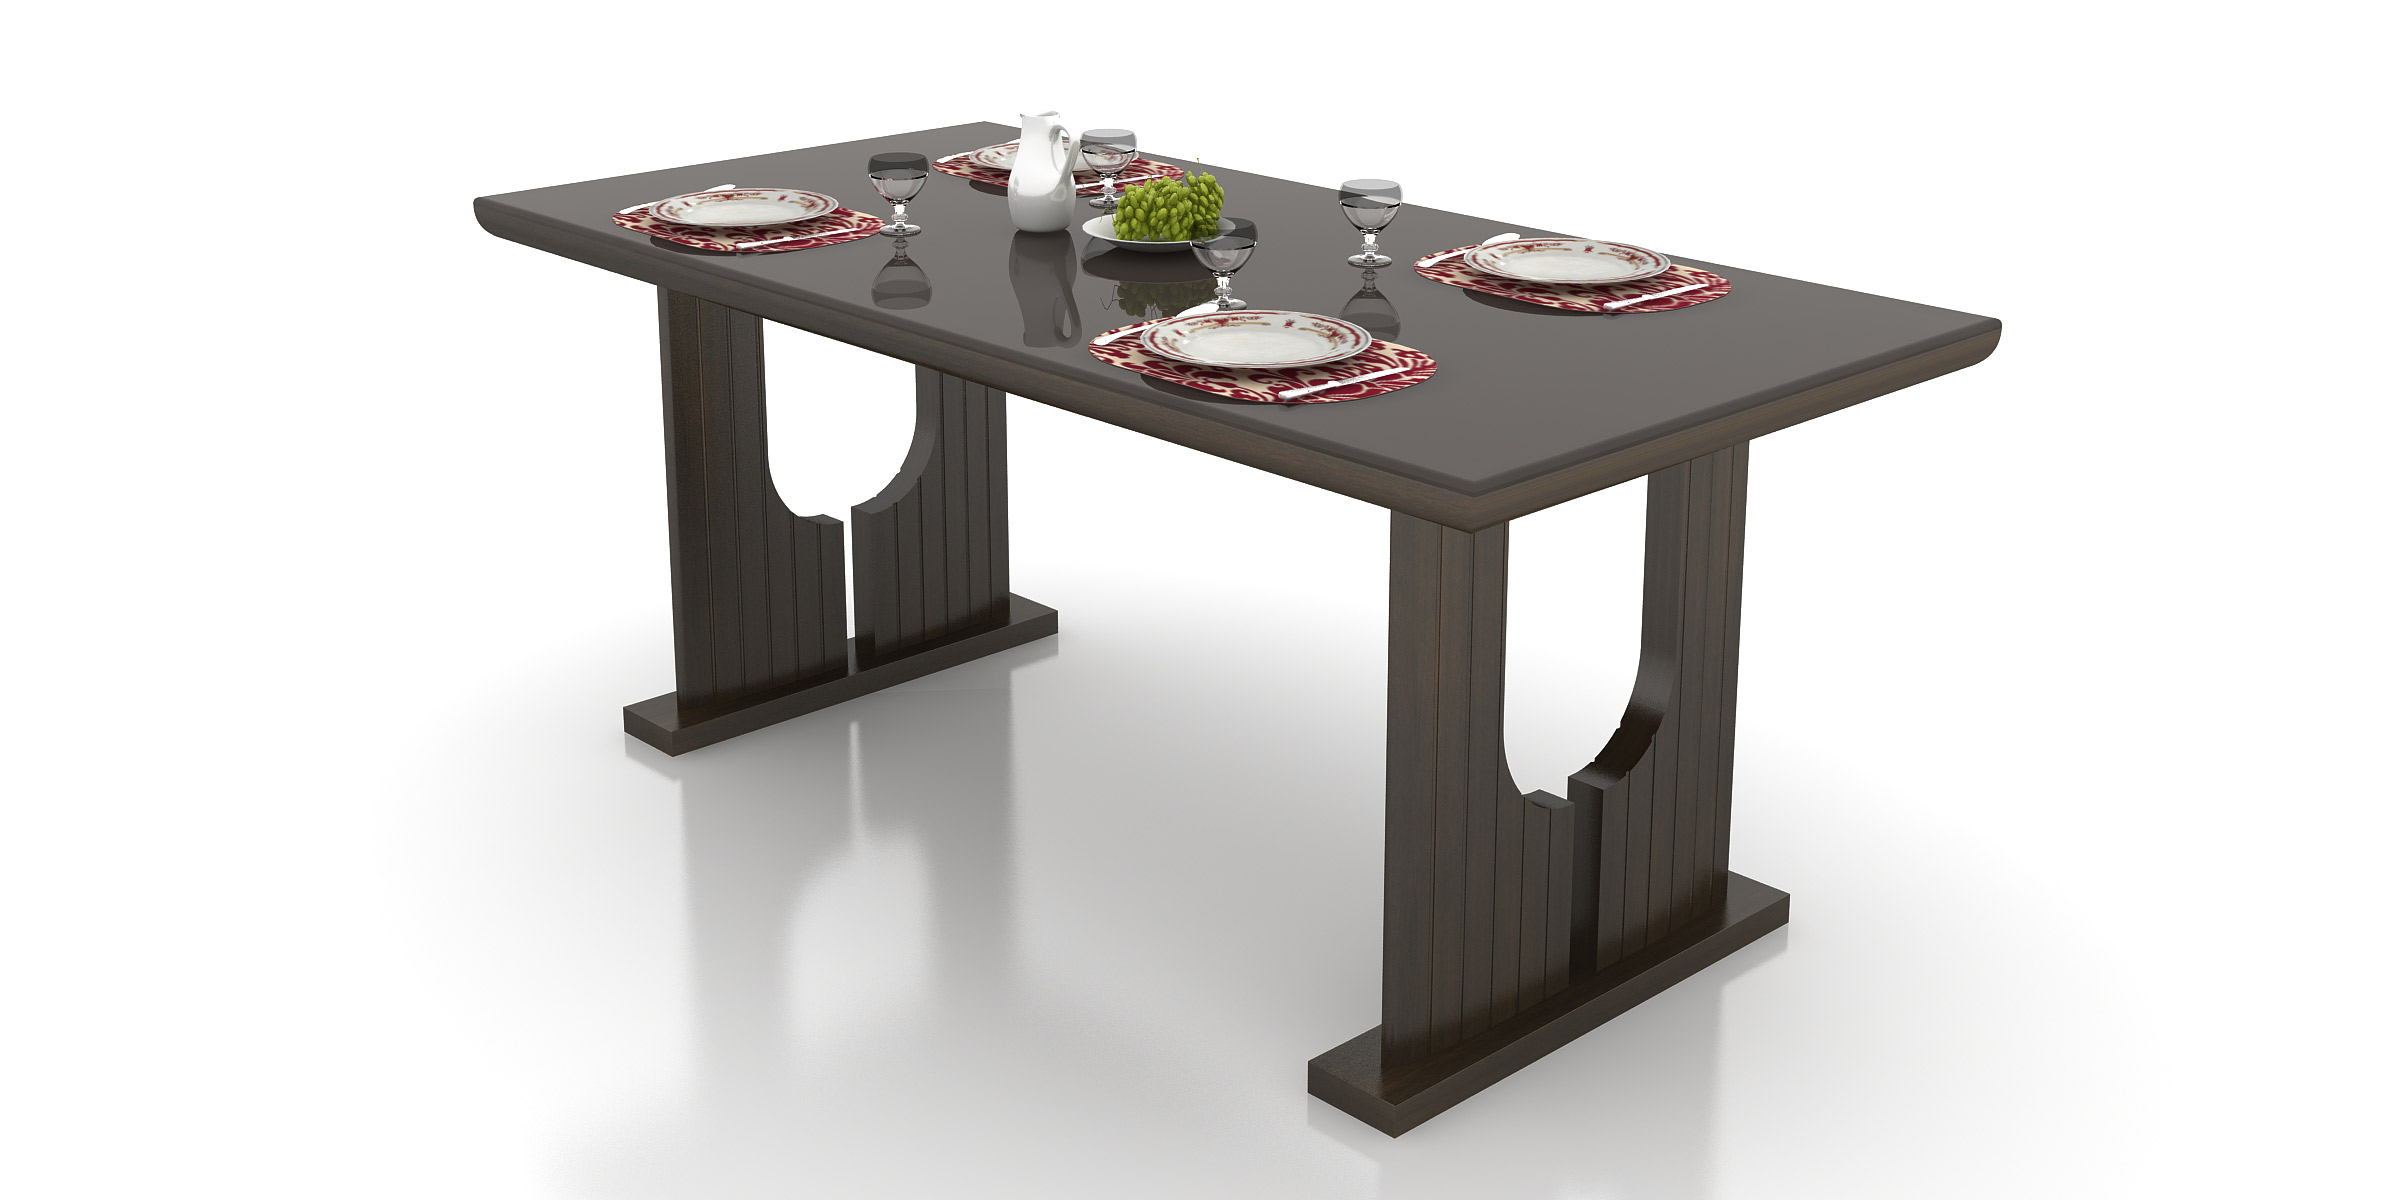 1496995635Contour_Table_01.jpg